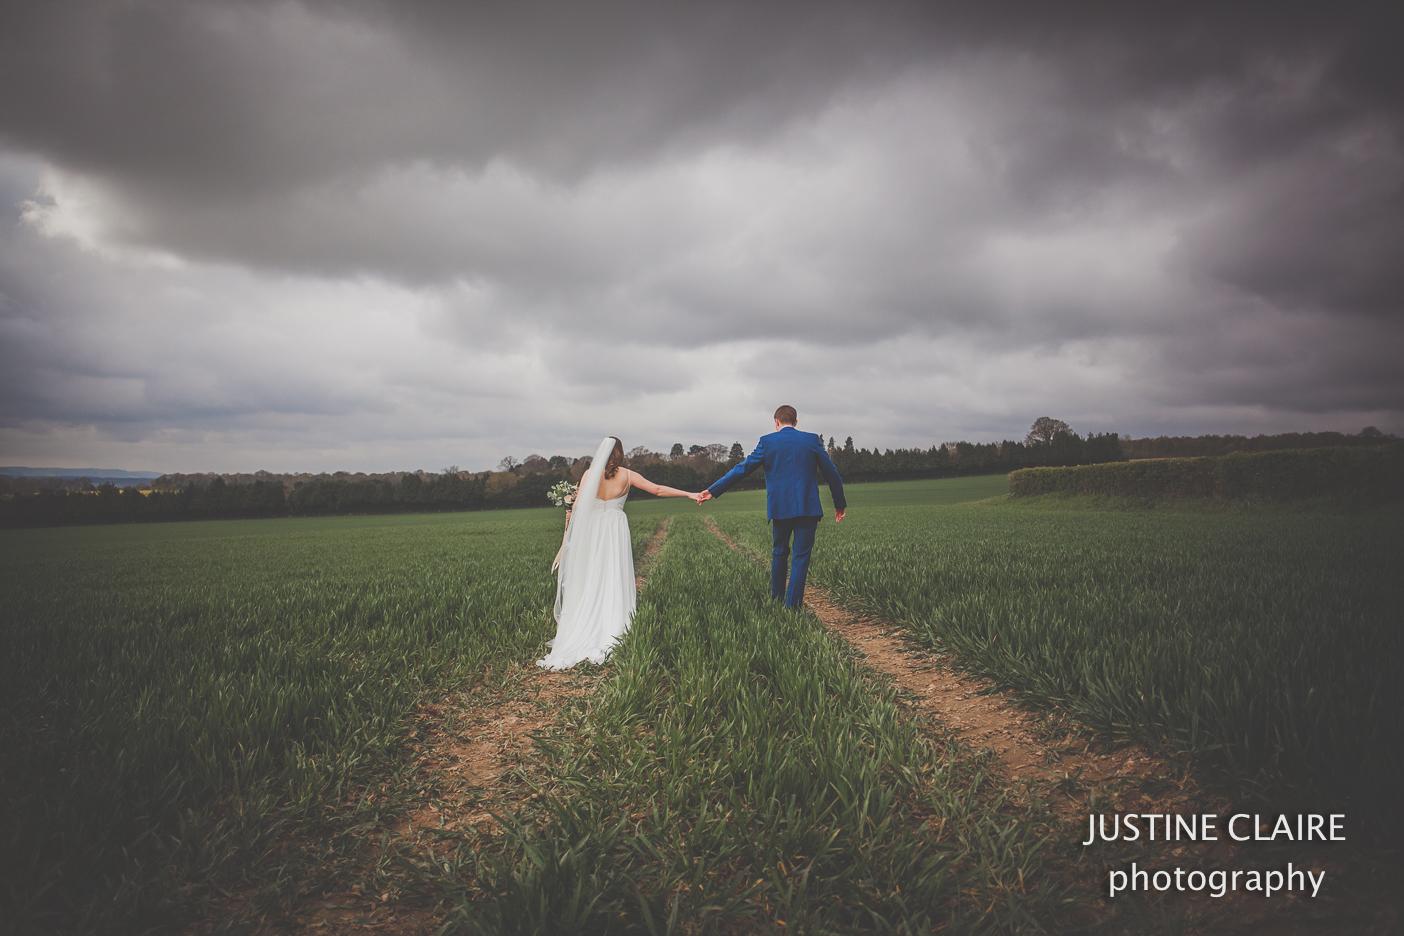 Fitzleroi Fittleworth petworth Billingshurst farm Wedding Photography by Justine Claire photographer Arundel Worthing Brighton-45.jpg